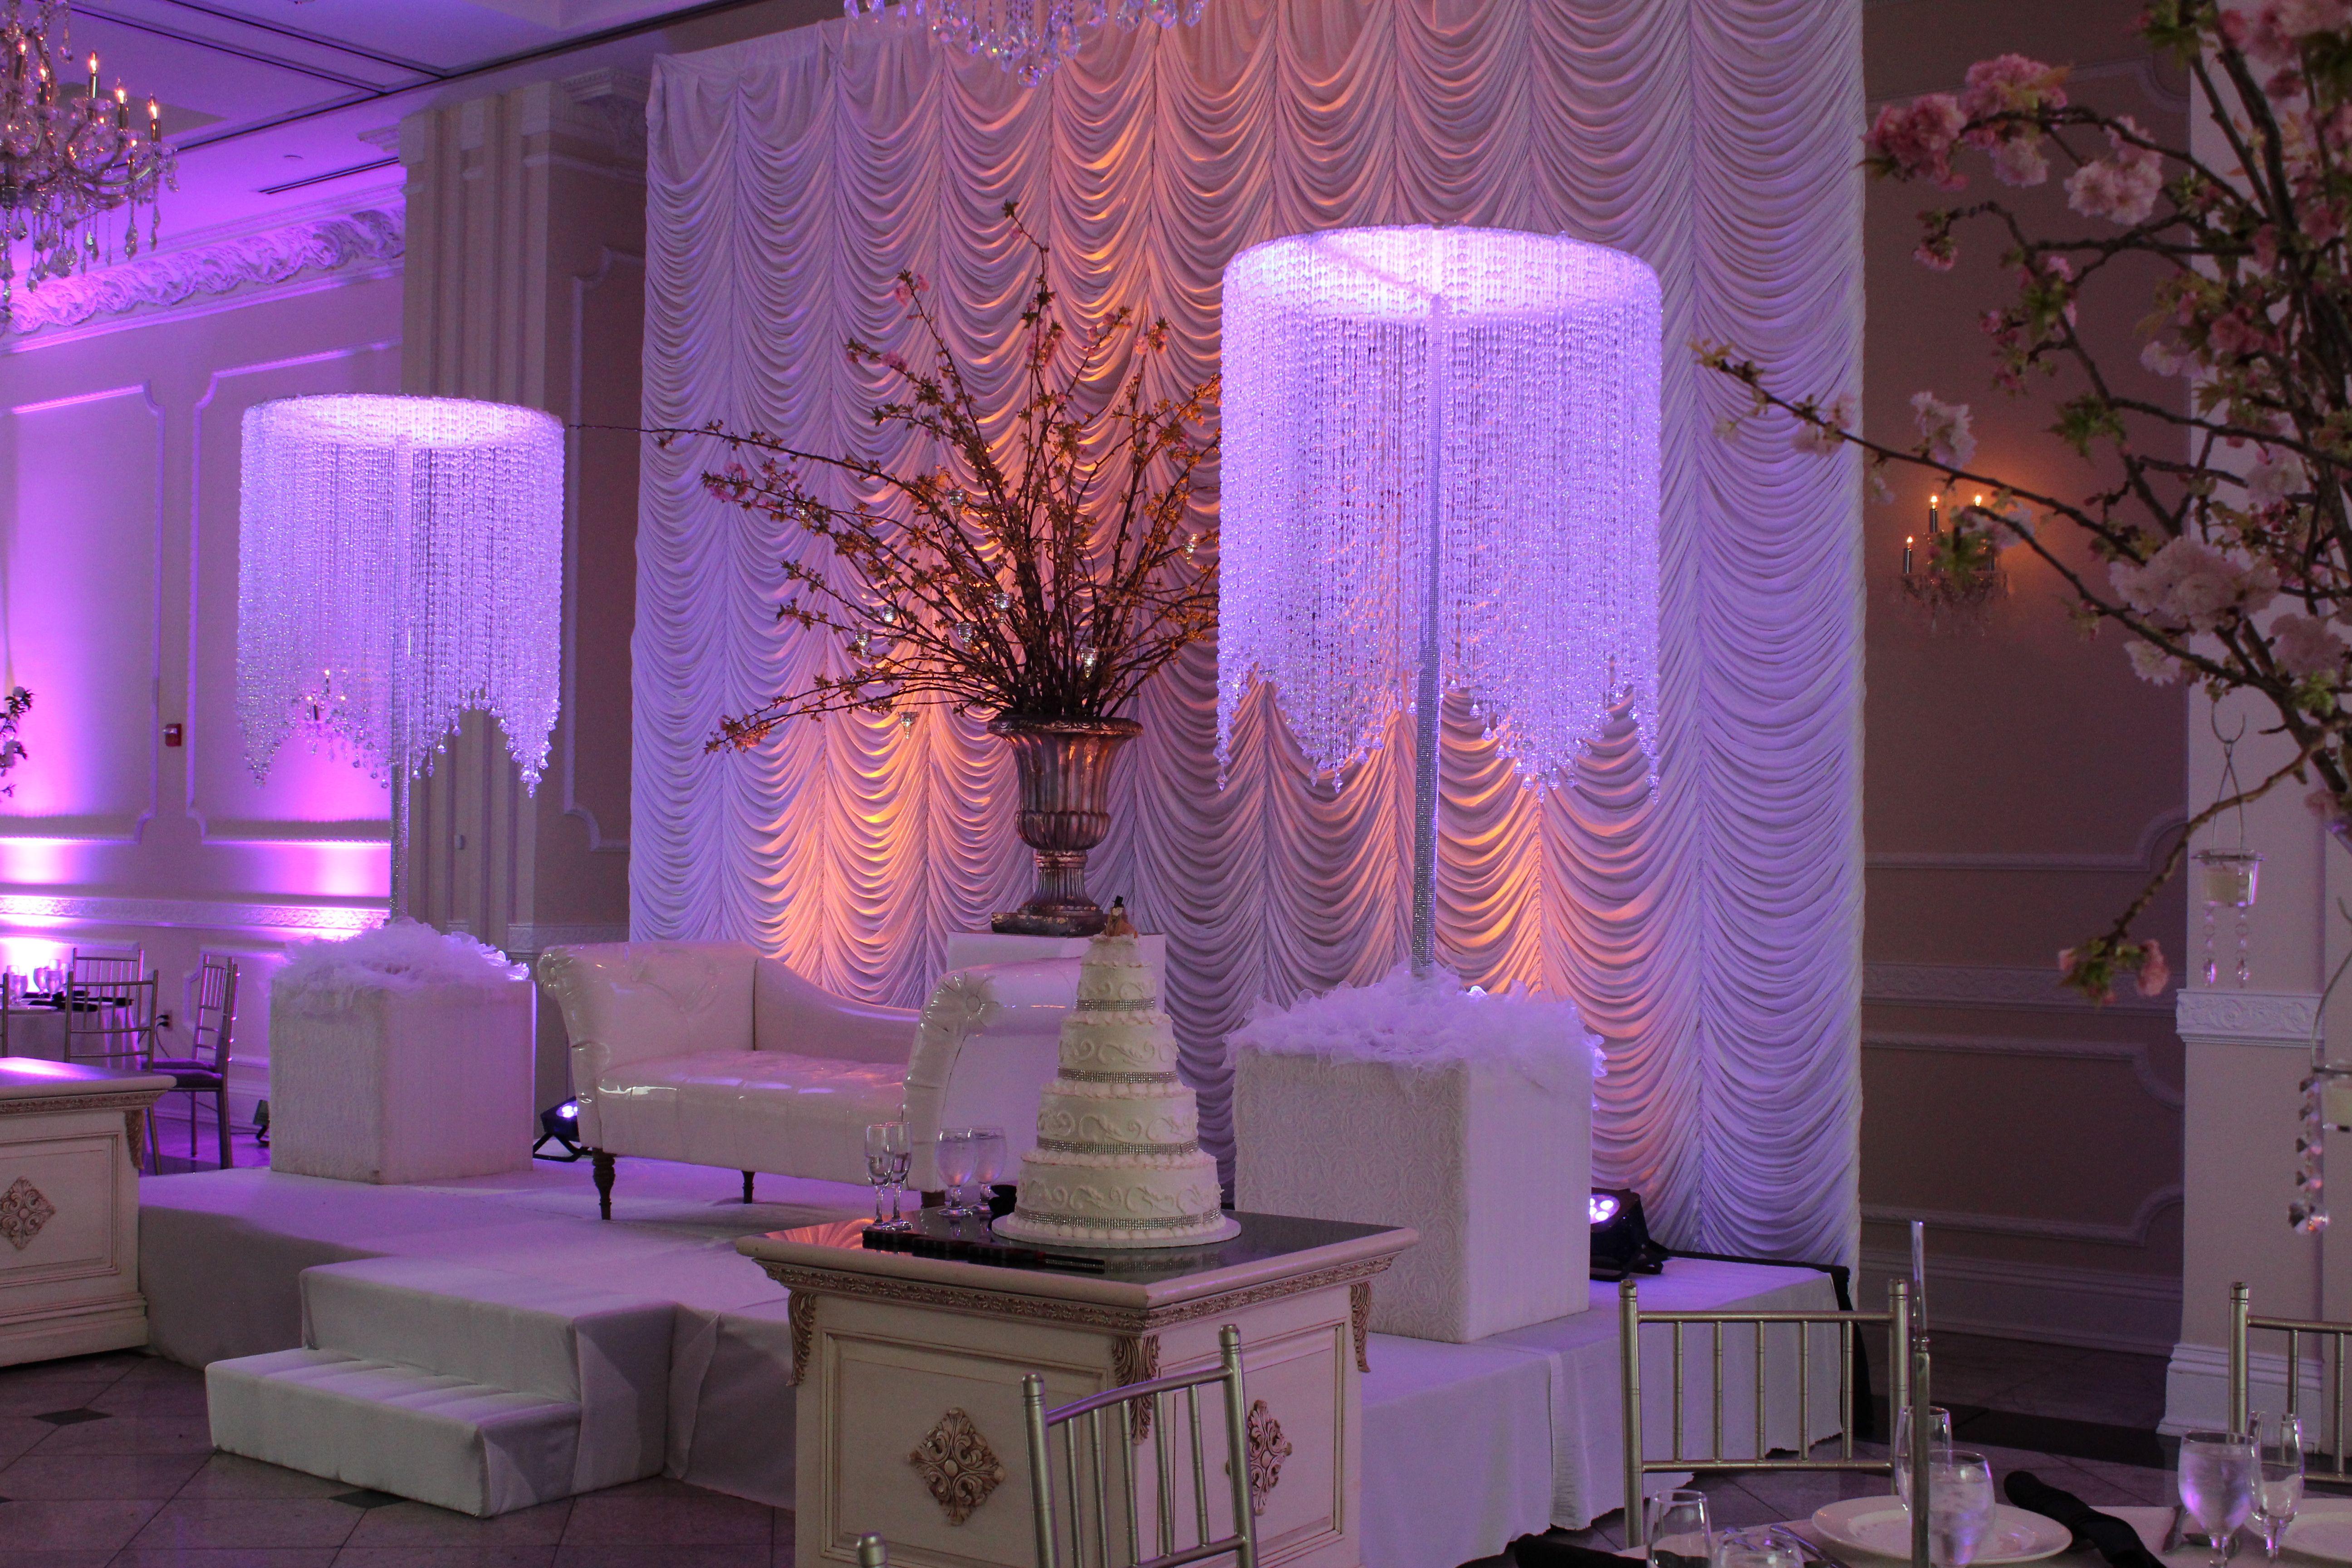 Addison Park NJ  Custom made crystal chandeliers